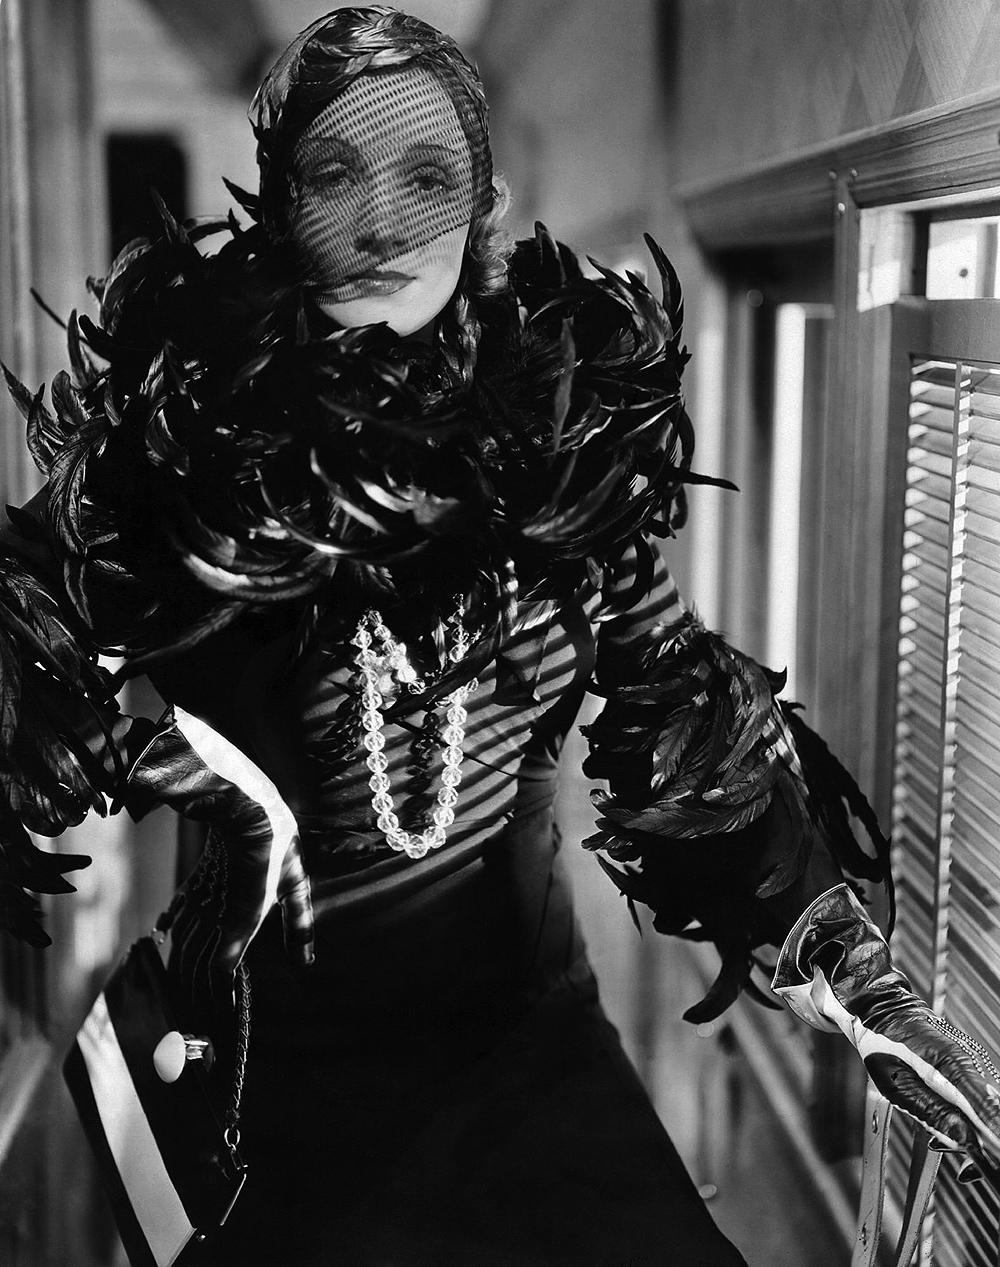 5-Dietrich-Coq-feathers.jpg